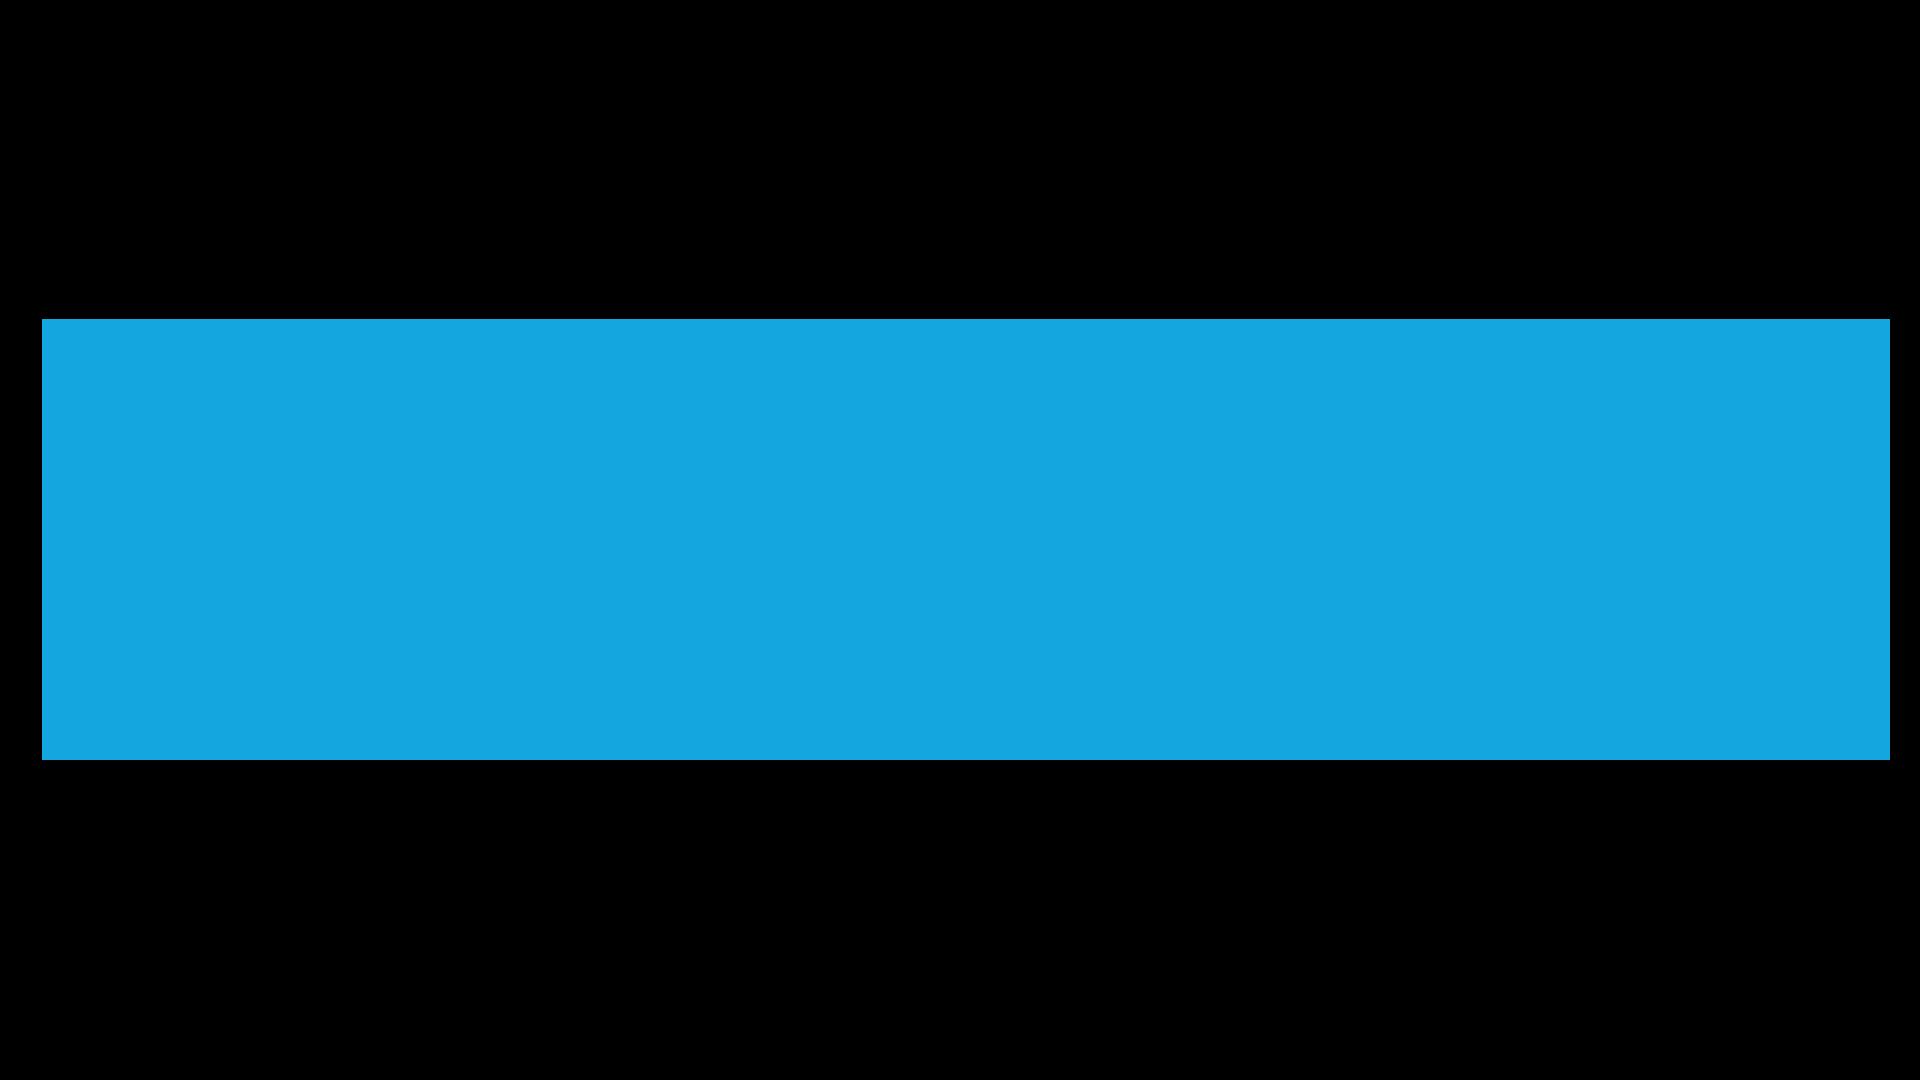 ANKER_WEB_LOGO